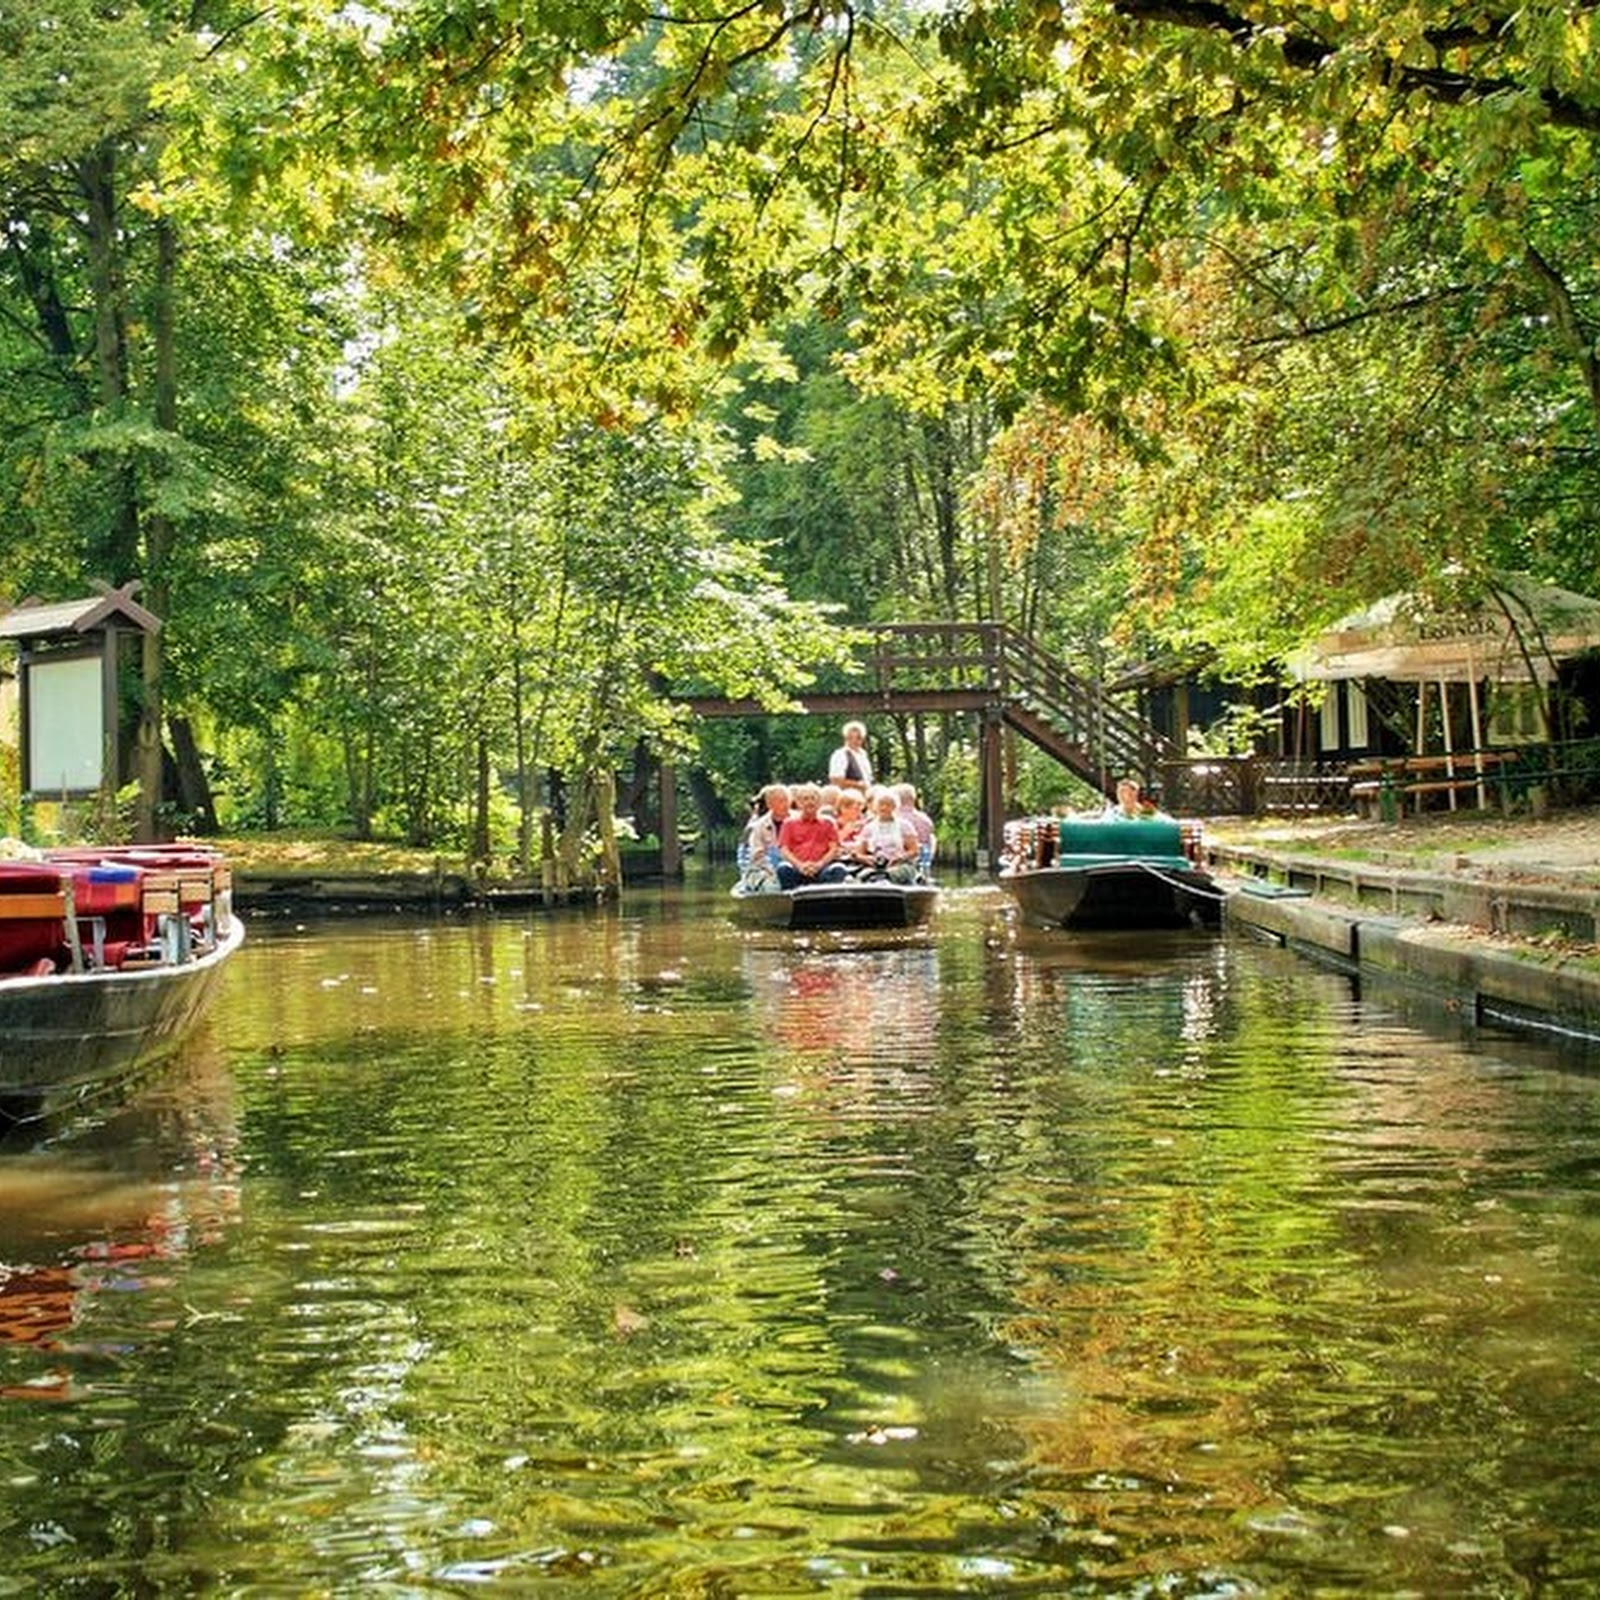 Spreewald: Germany's Venice